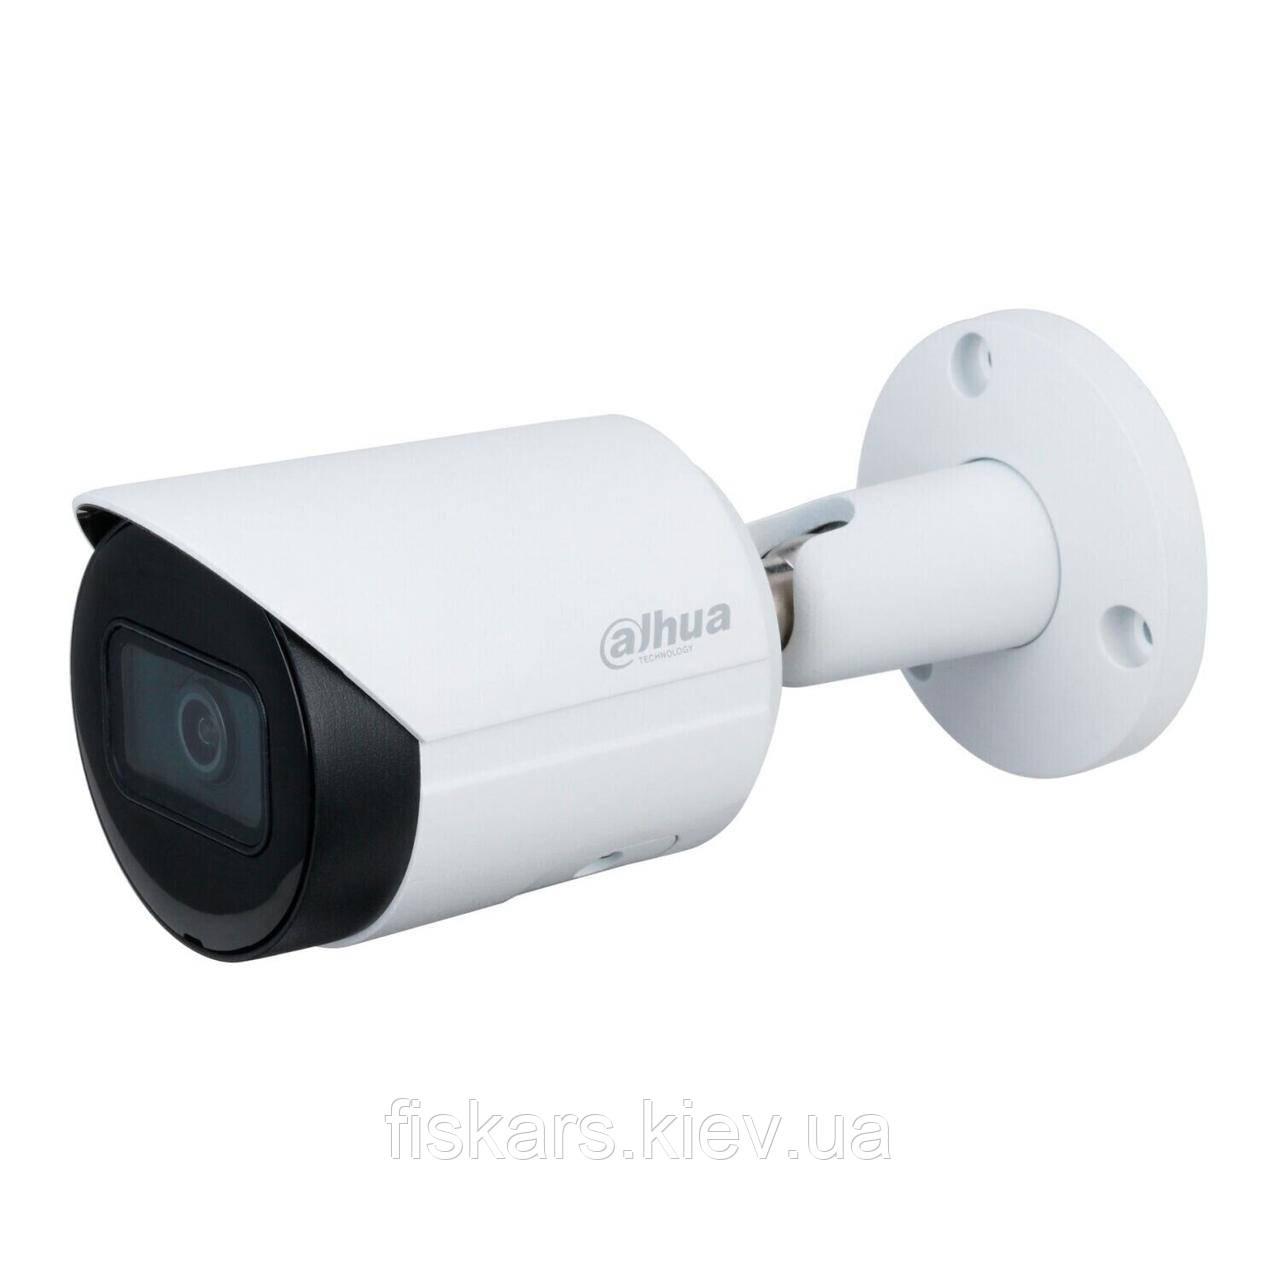 8 Mп IP-камера Dahua DH-IPC-HFW2831SP-S-S2